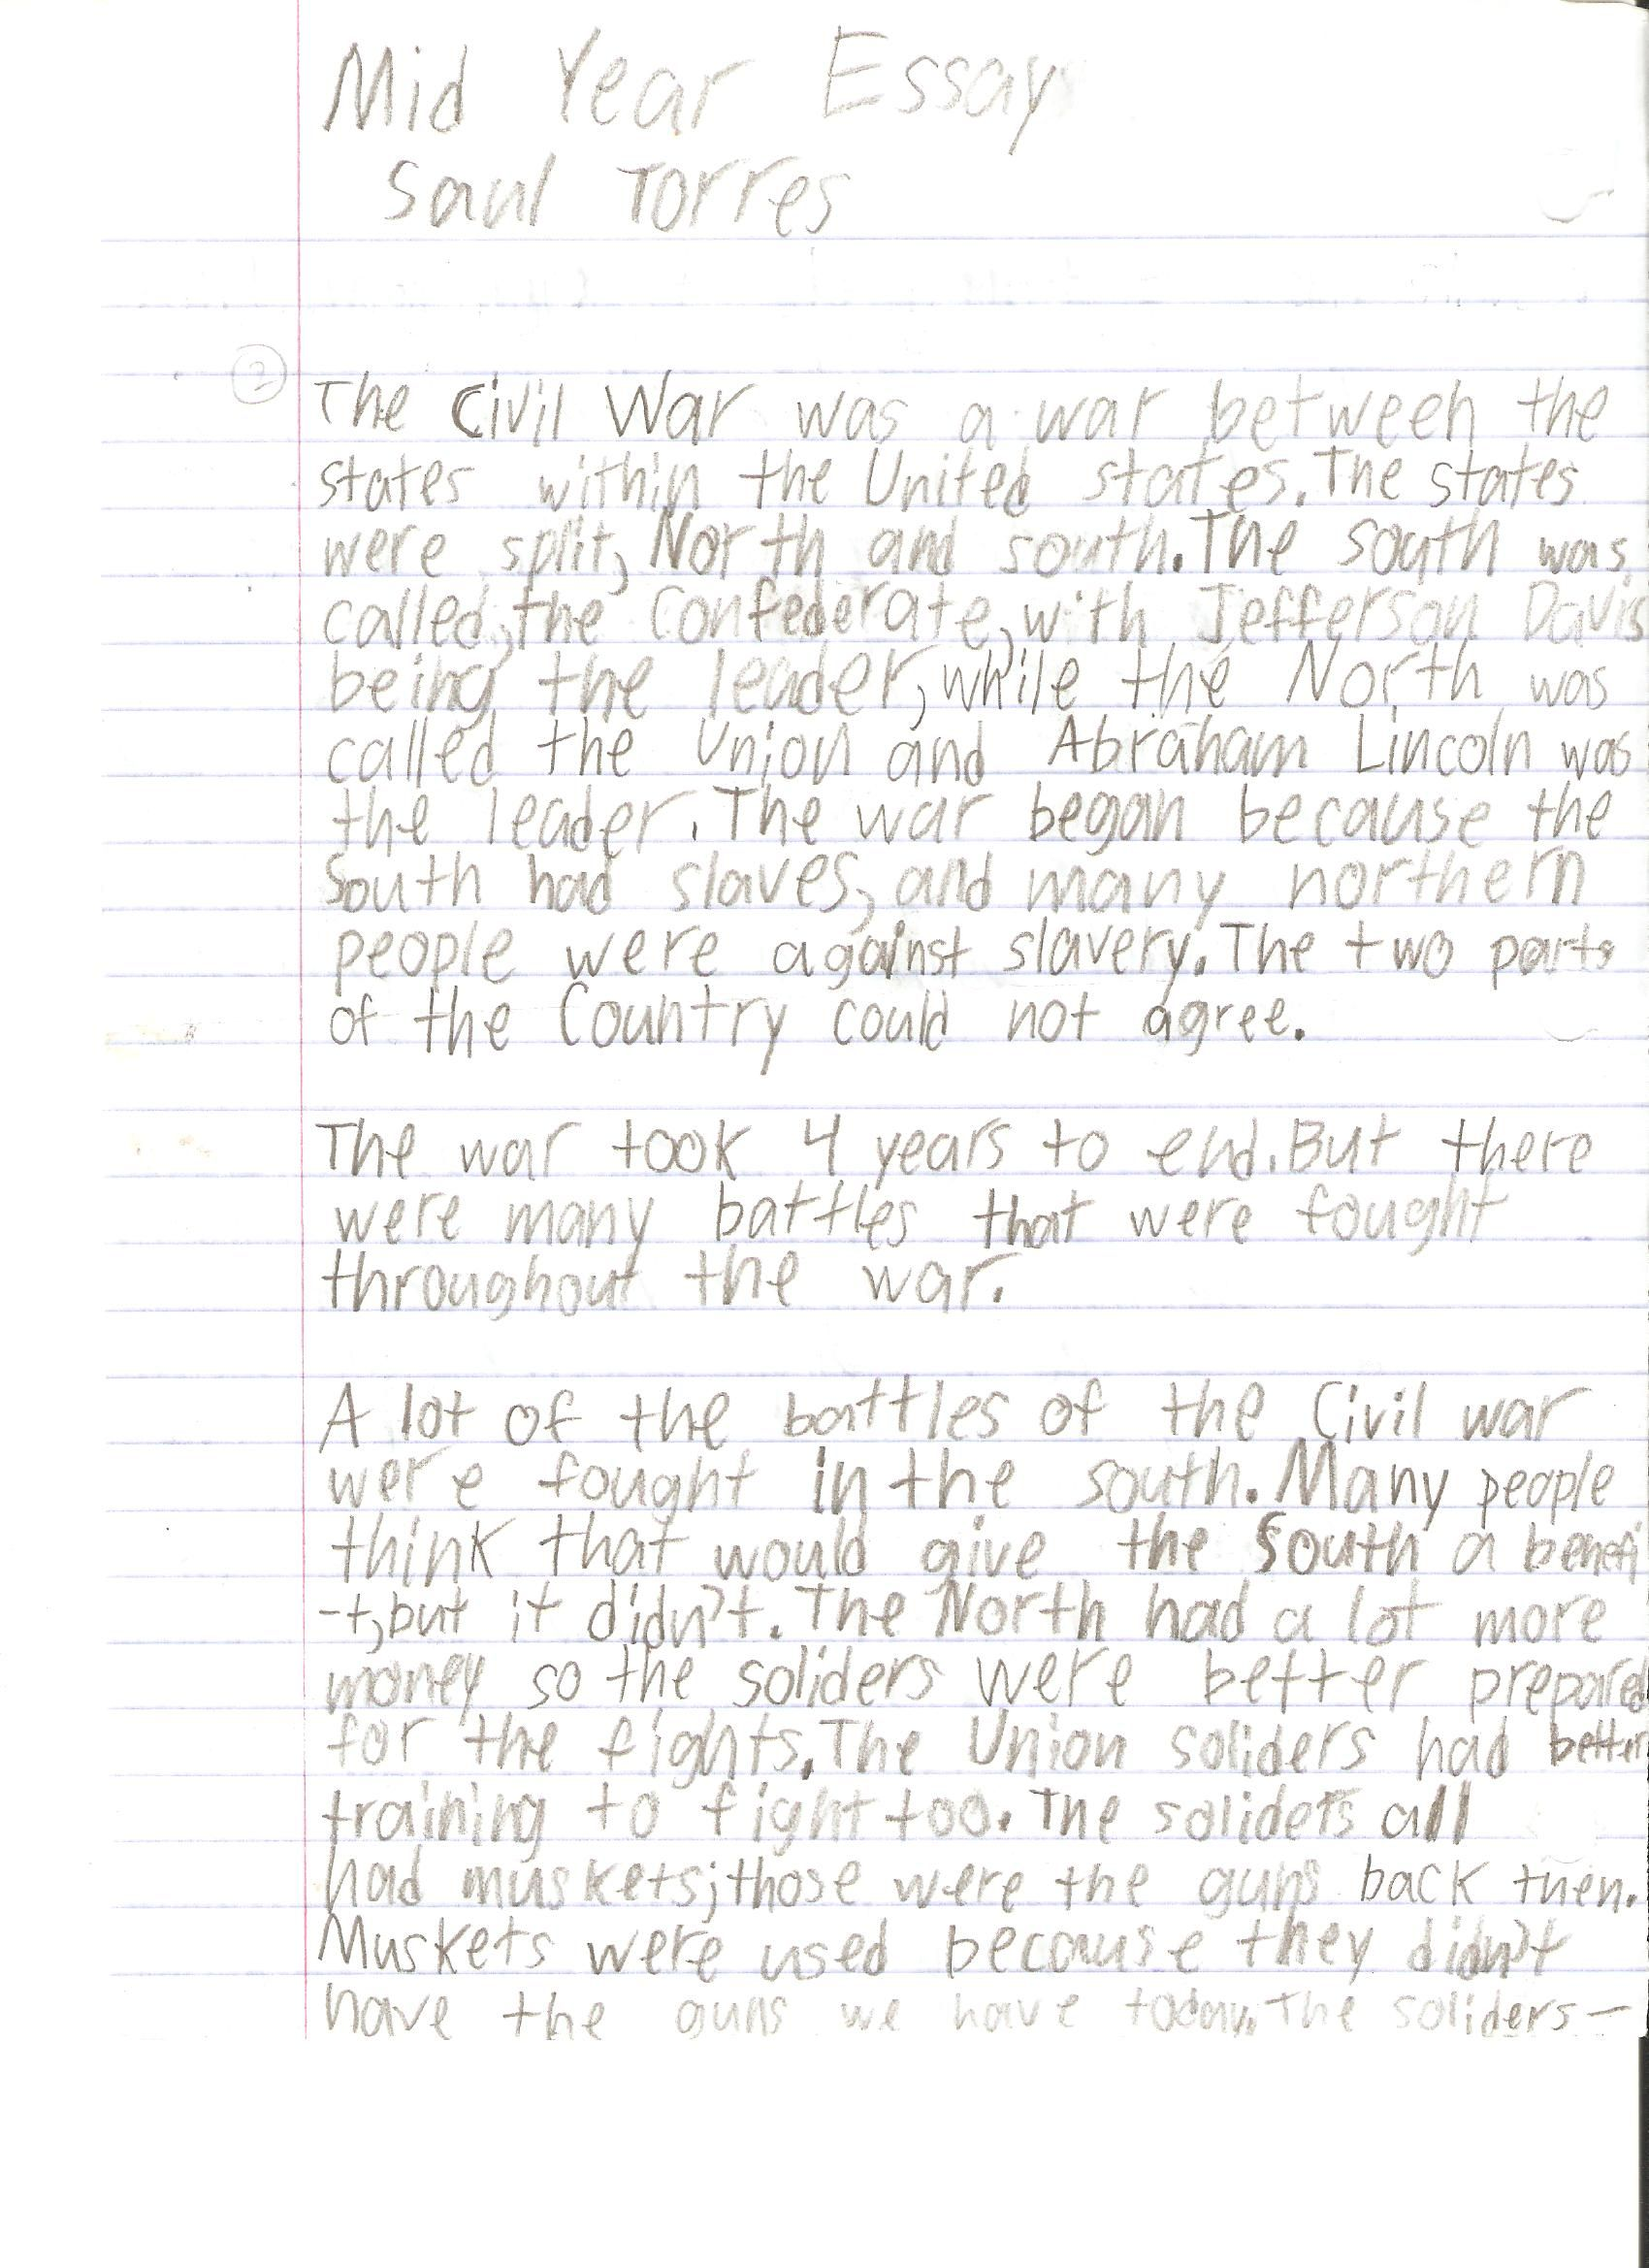 7th Grade Essay Writing Persuasive Student Writing Sample